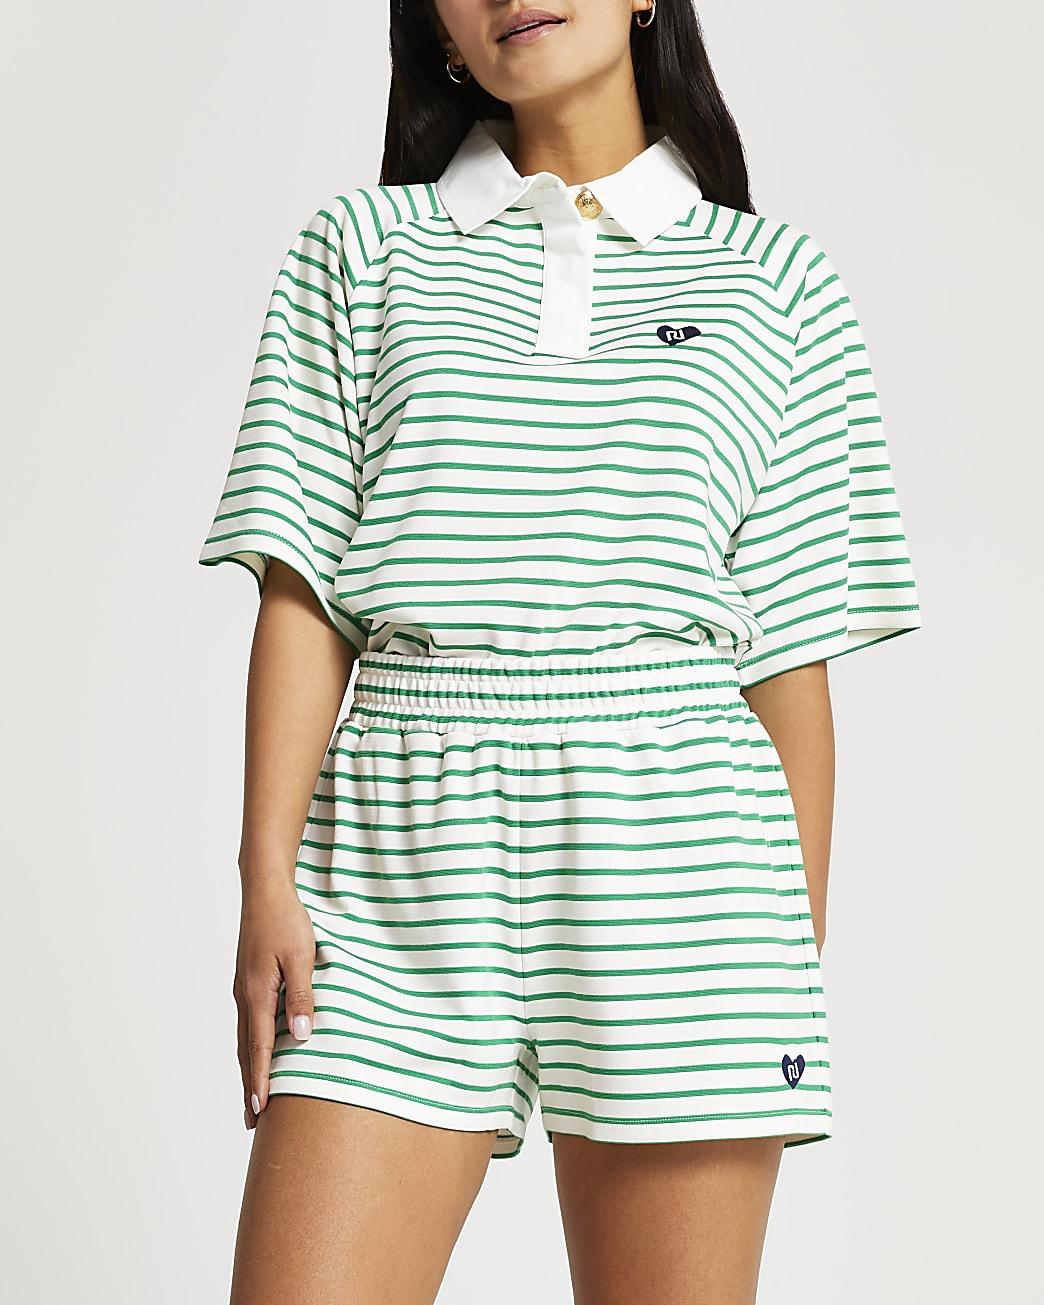 Petite green stripe shorts